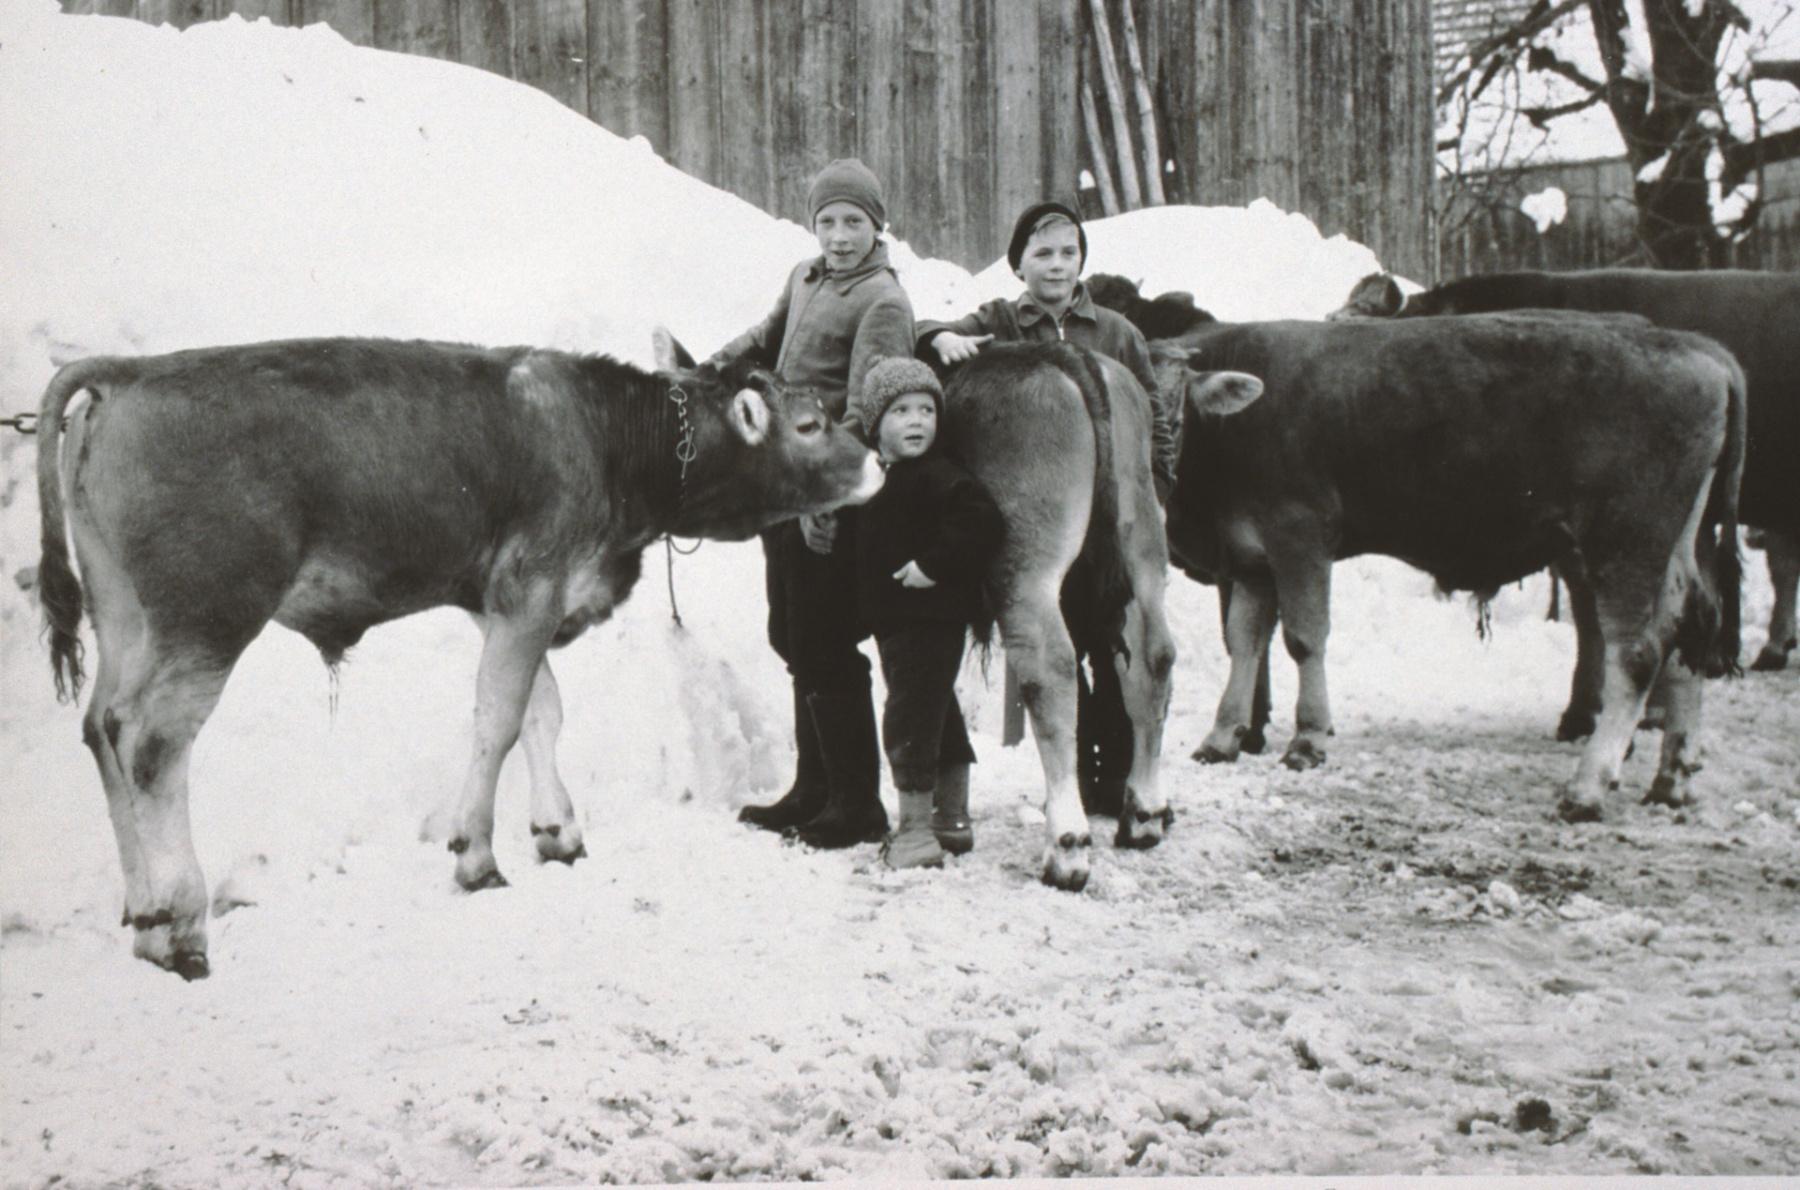 Viehprämierung Berg in Kleinbäretswil, vlnr Köbi Gentner (heute Pneu Gentner Hittnau), Peter Gentner (heute Kaminfegergeschäft), Andreas Egli (Sekelmeisters)